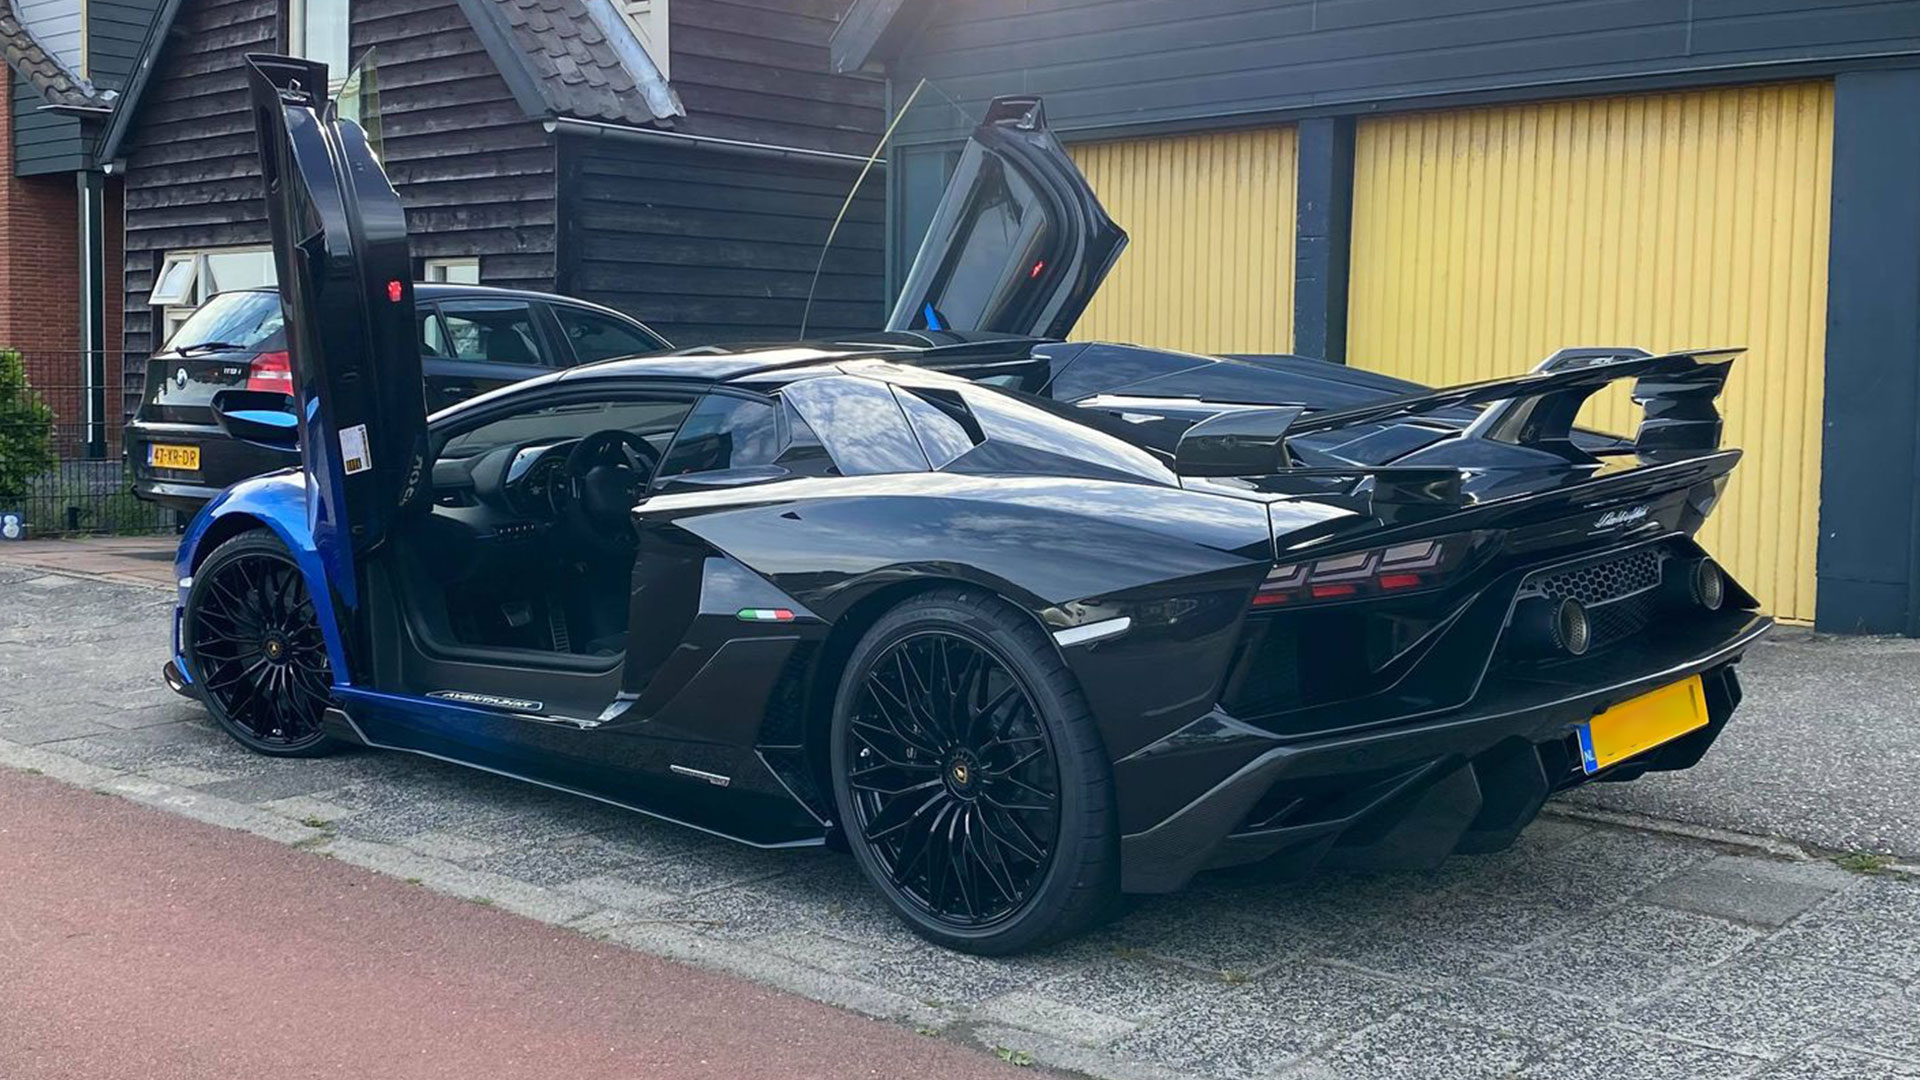 Lamborghini SVJ Roadster - duurste auto van Nederland in2020